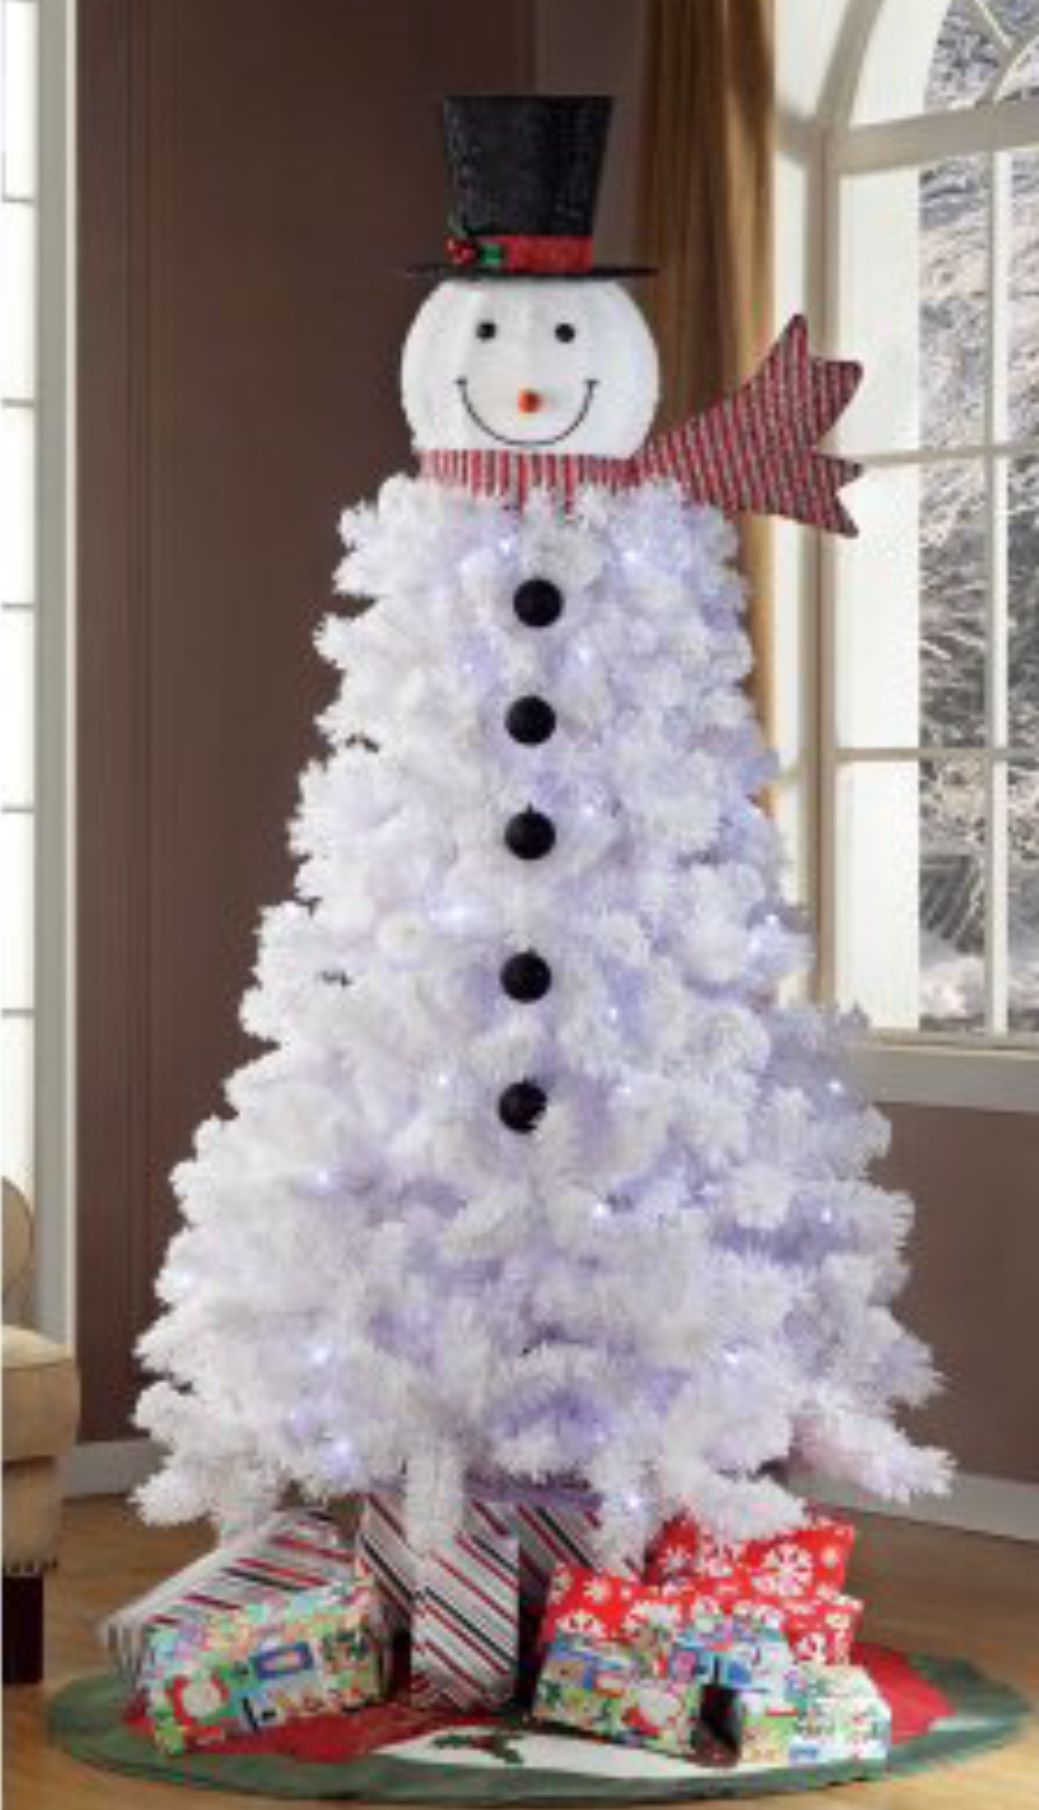 Pre Lit 6 5 Ft Snowman Christmas Tree From Walmart Cute Idea